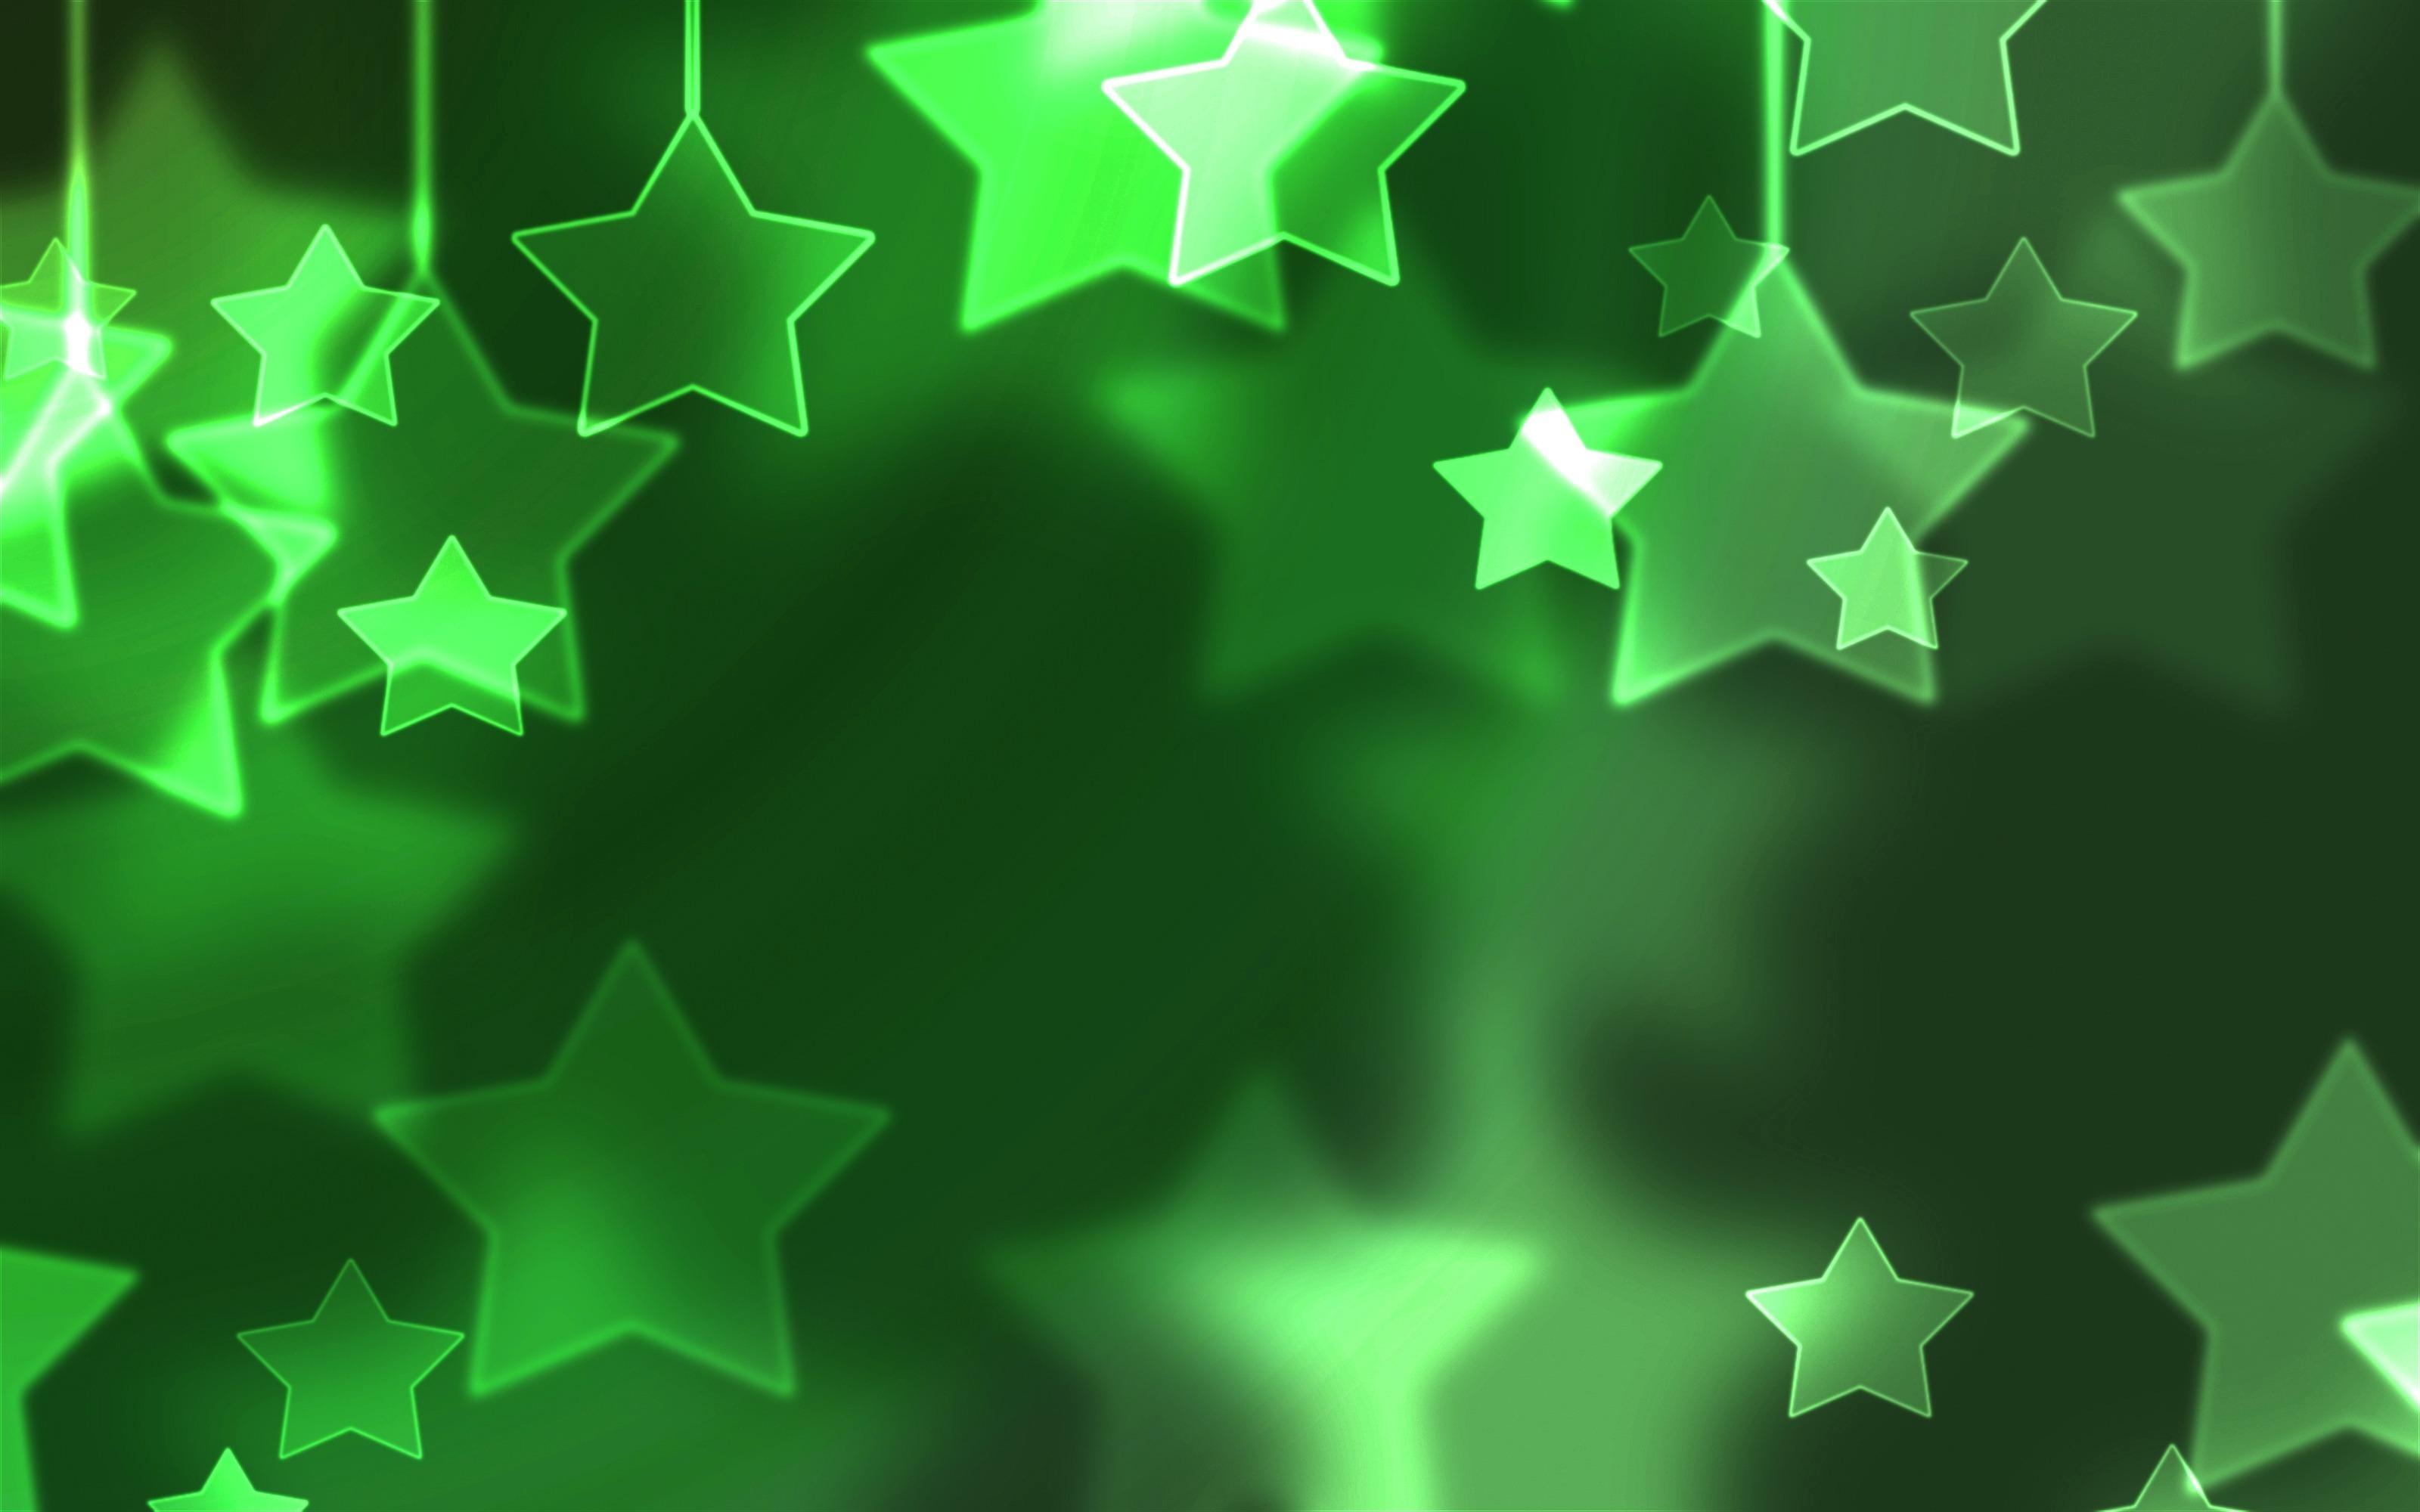 Christmas Green.Titulinis Dėkojame Ir Sveikiname Green Christmas